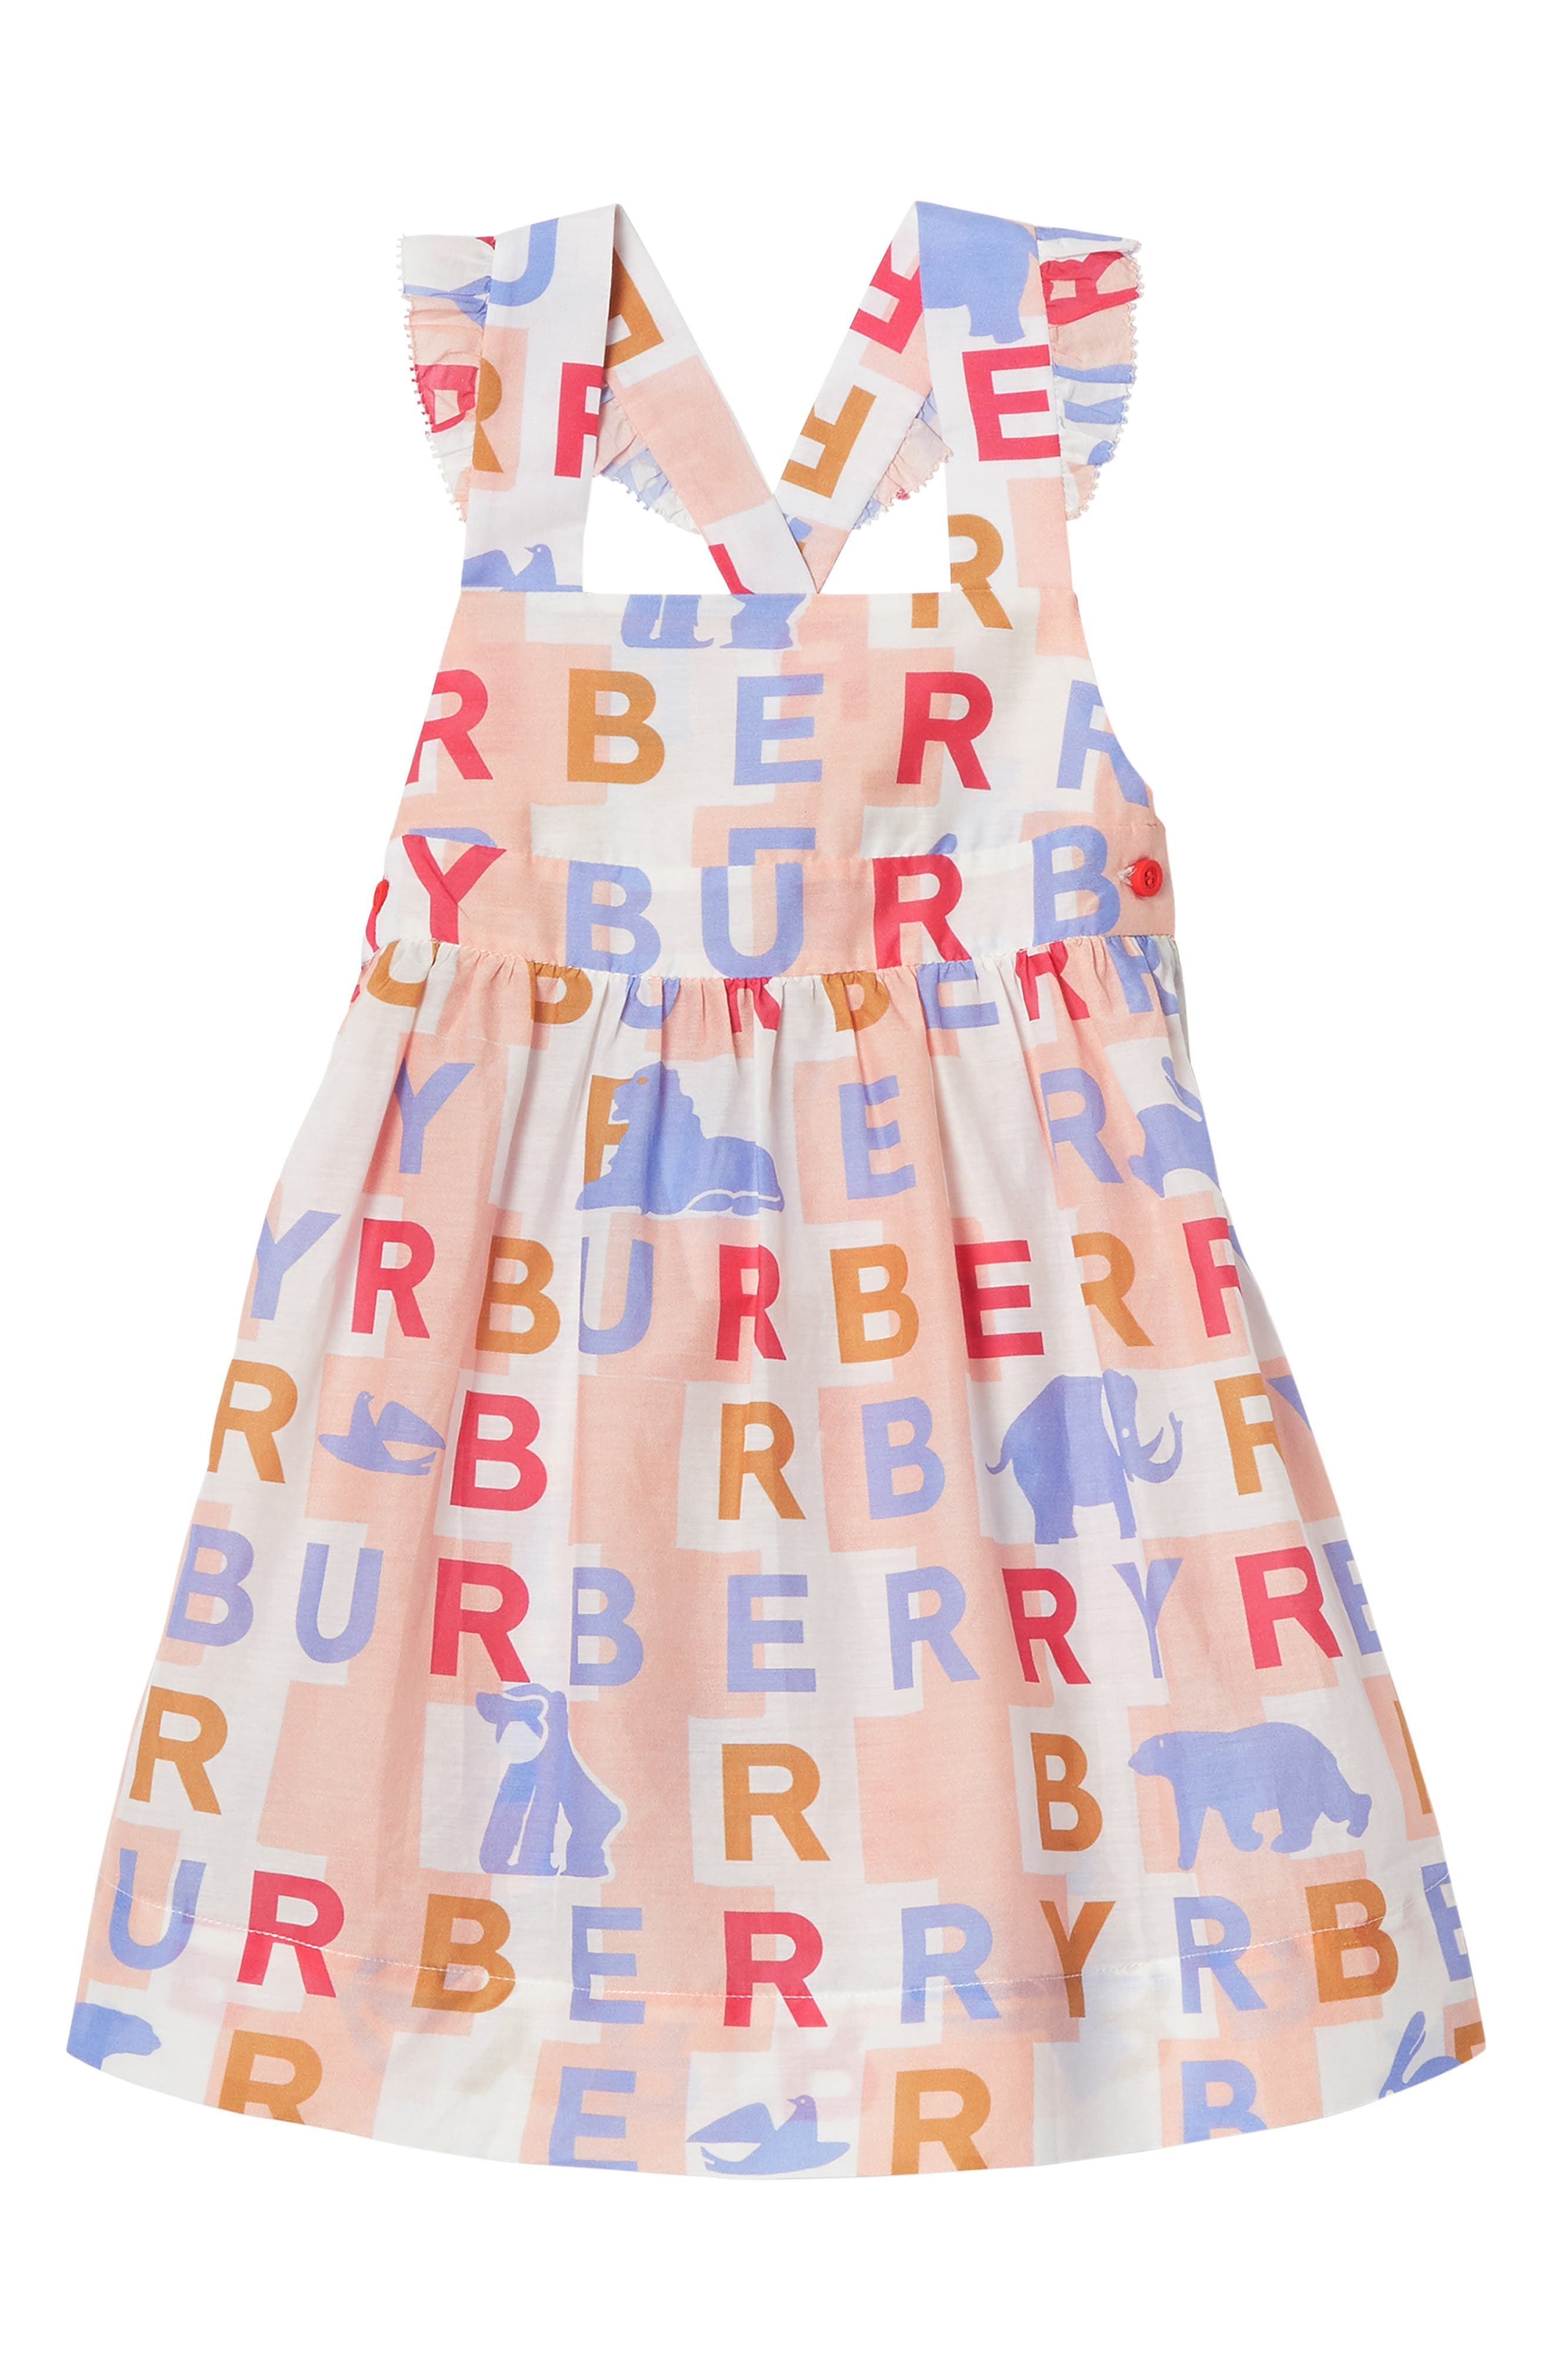 BURBERRY Burbery Mini Livia Cotton & Silk Pinafore Dress, Main, color, PALE ROSE